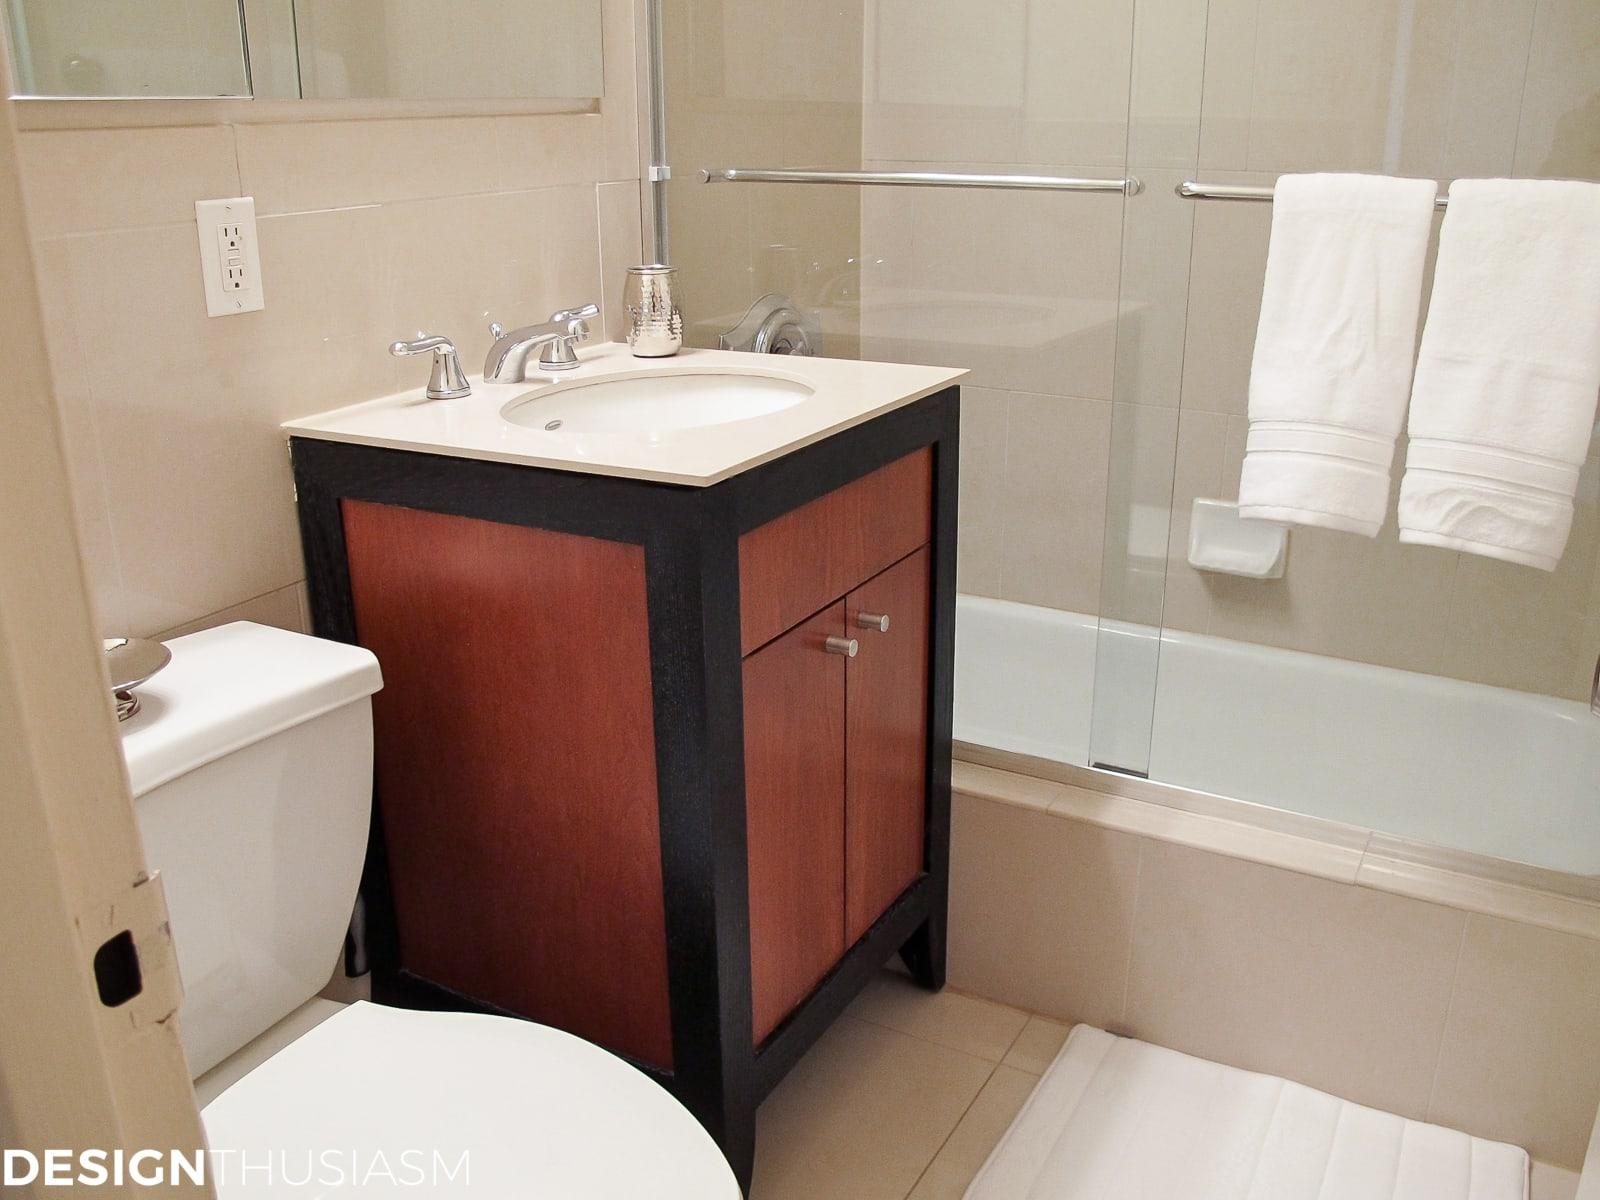 Bachelor Pad Decor Part 3: Classic Mens Bedroom Ideas